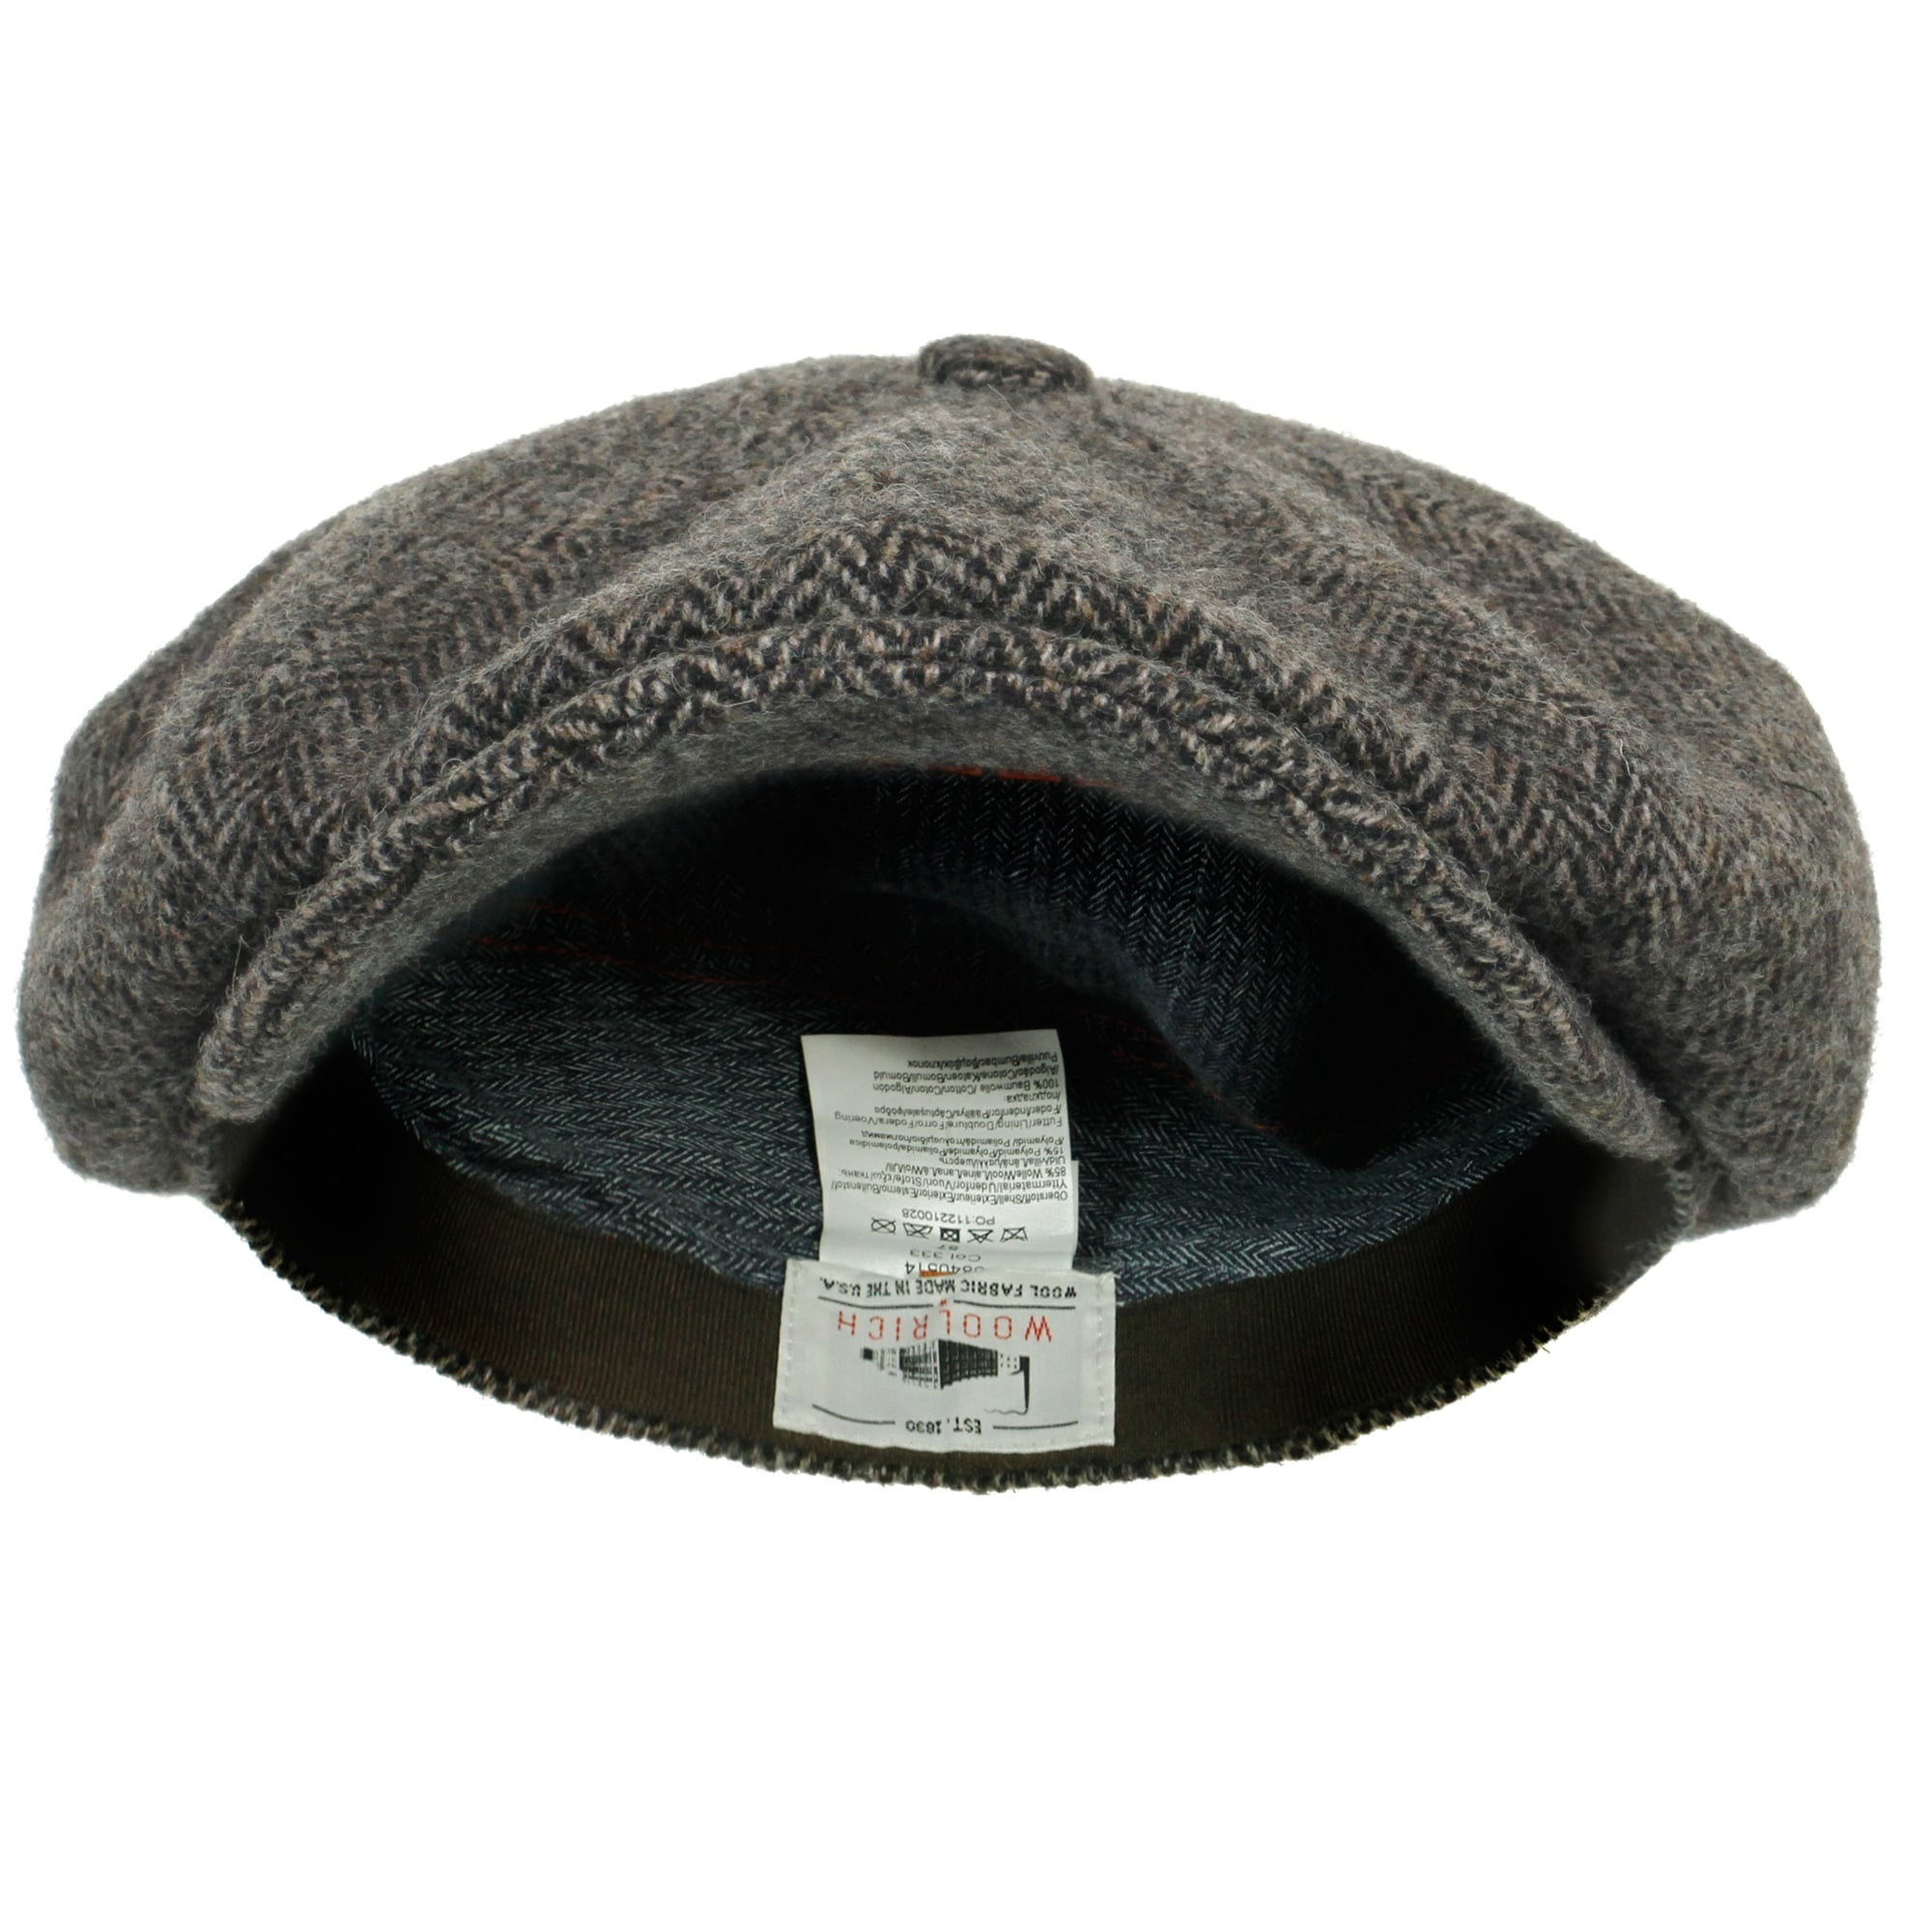 Stetson Hatteras Woolrich Herringbone Grey Newsboy Hat 6840514 333 673a5da3b9d